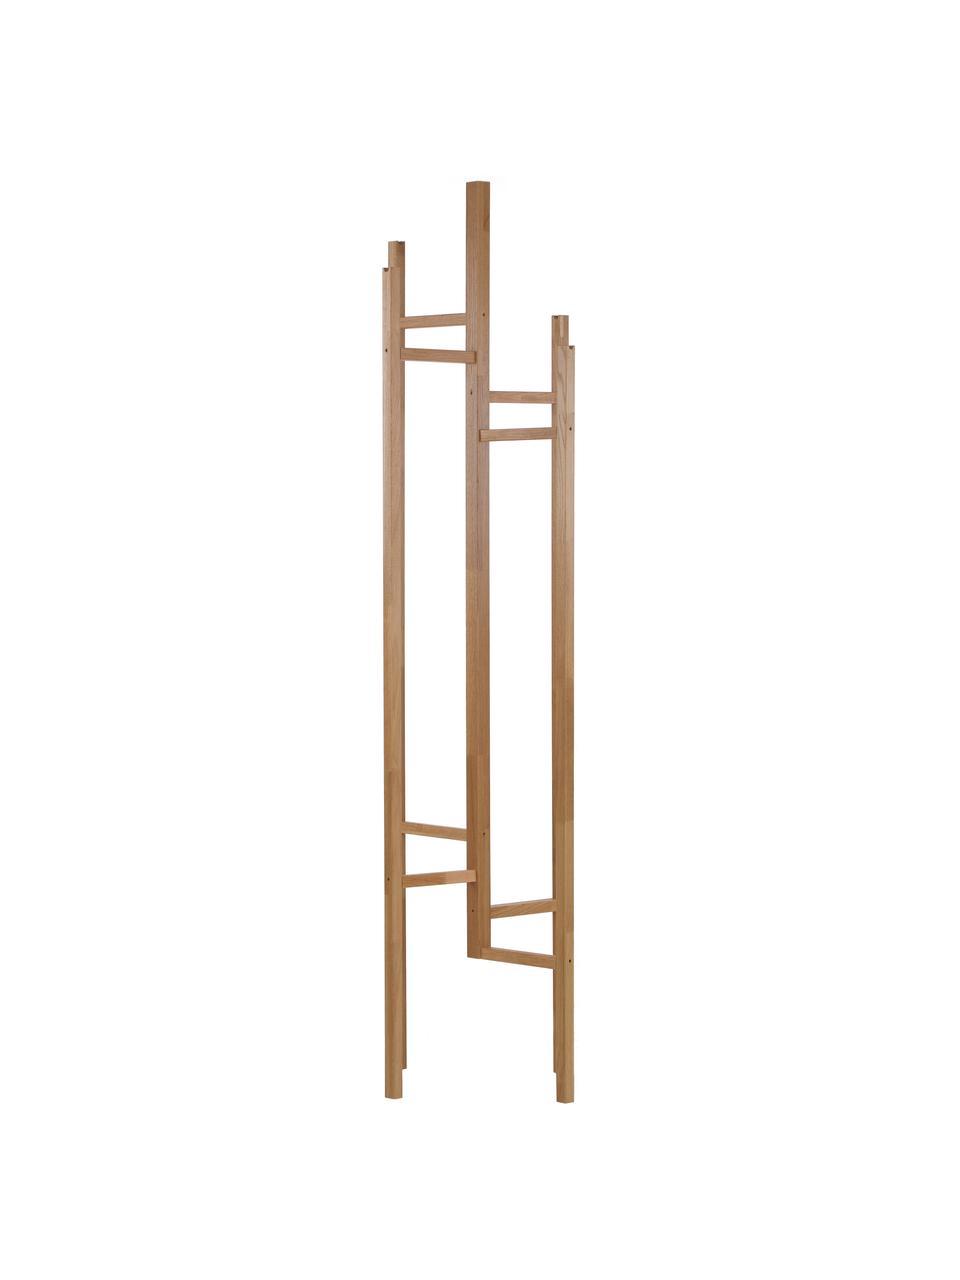 Moderne Garderobe Eigen mit 5 Haken, Eichenholz, massiv, Eichenholz, 47 x 175 cm